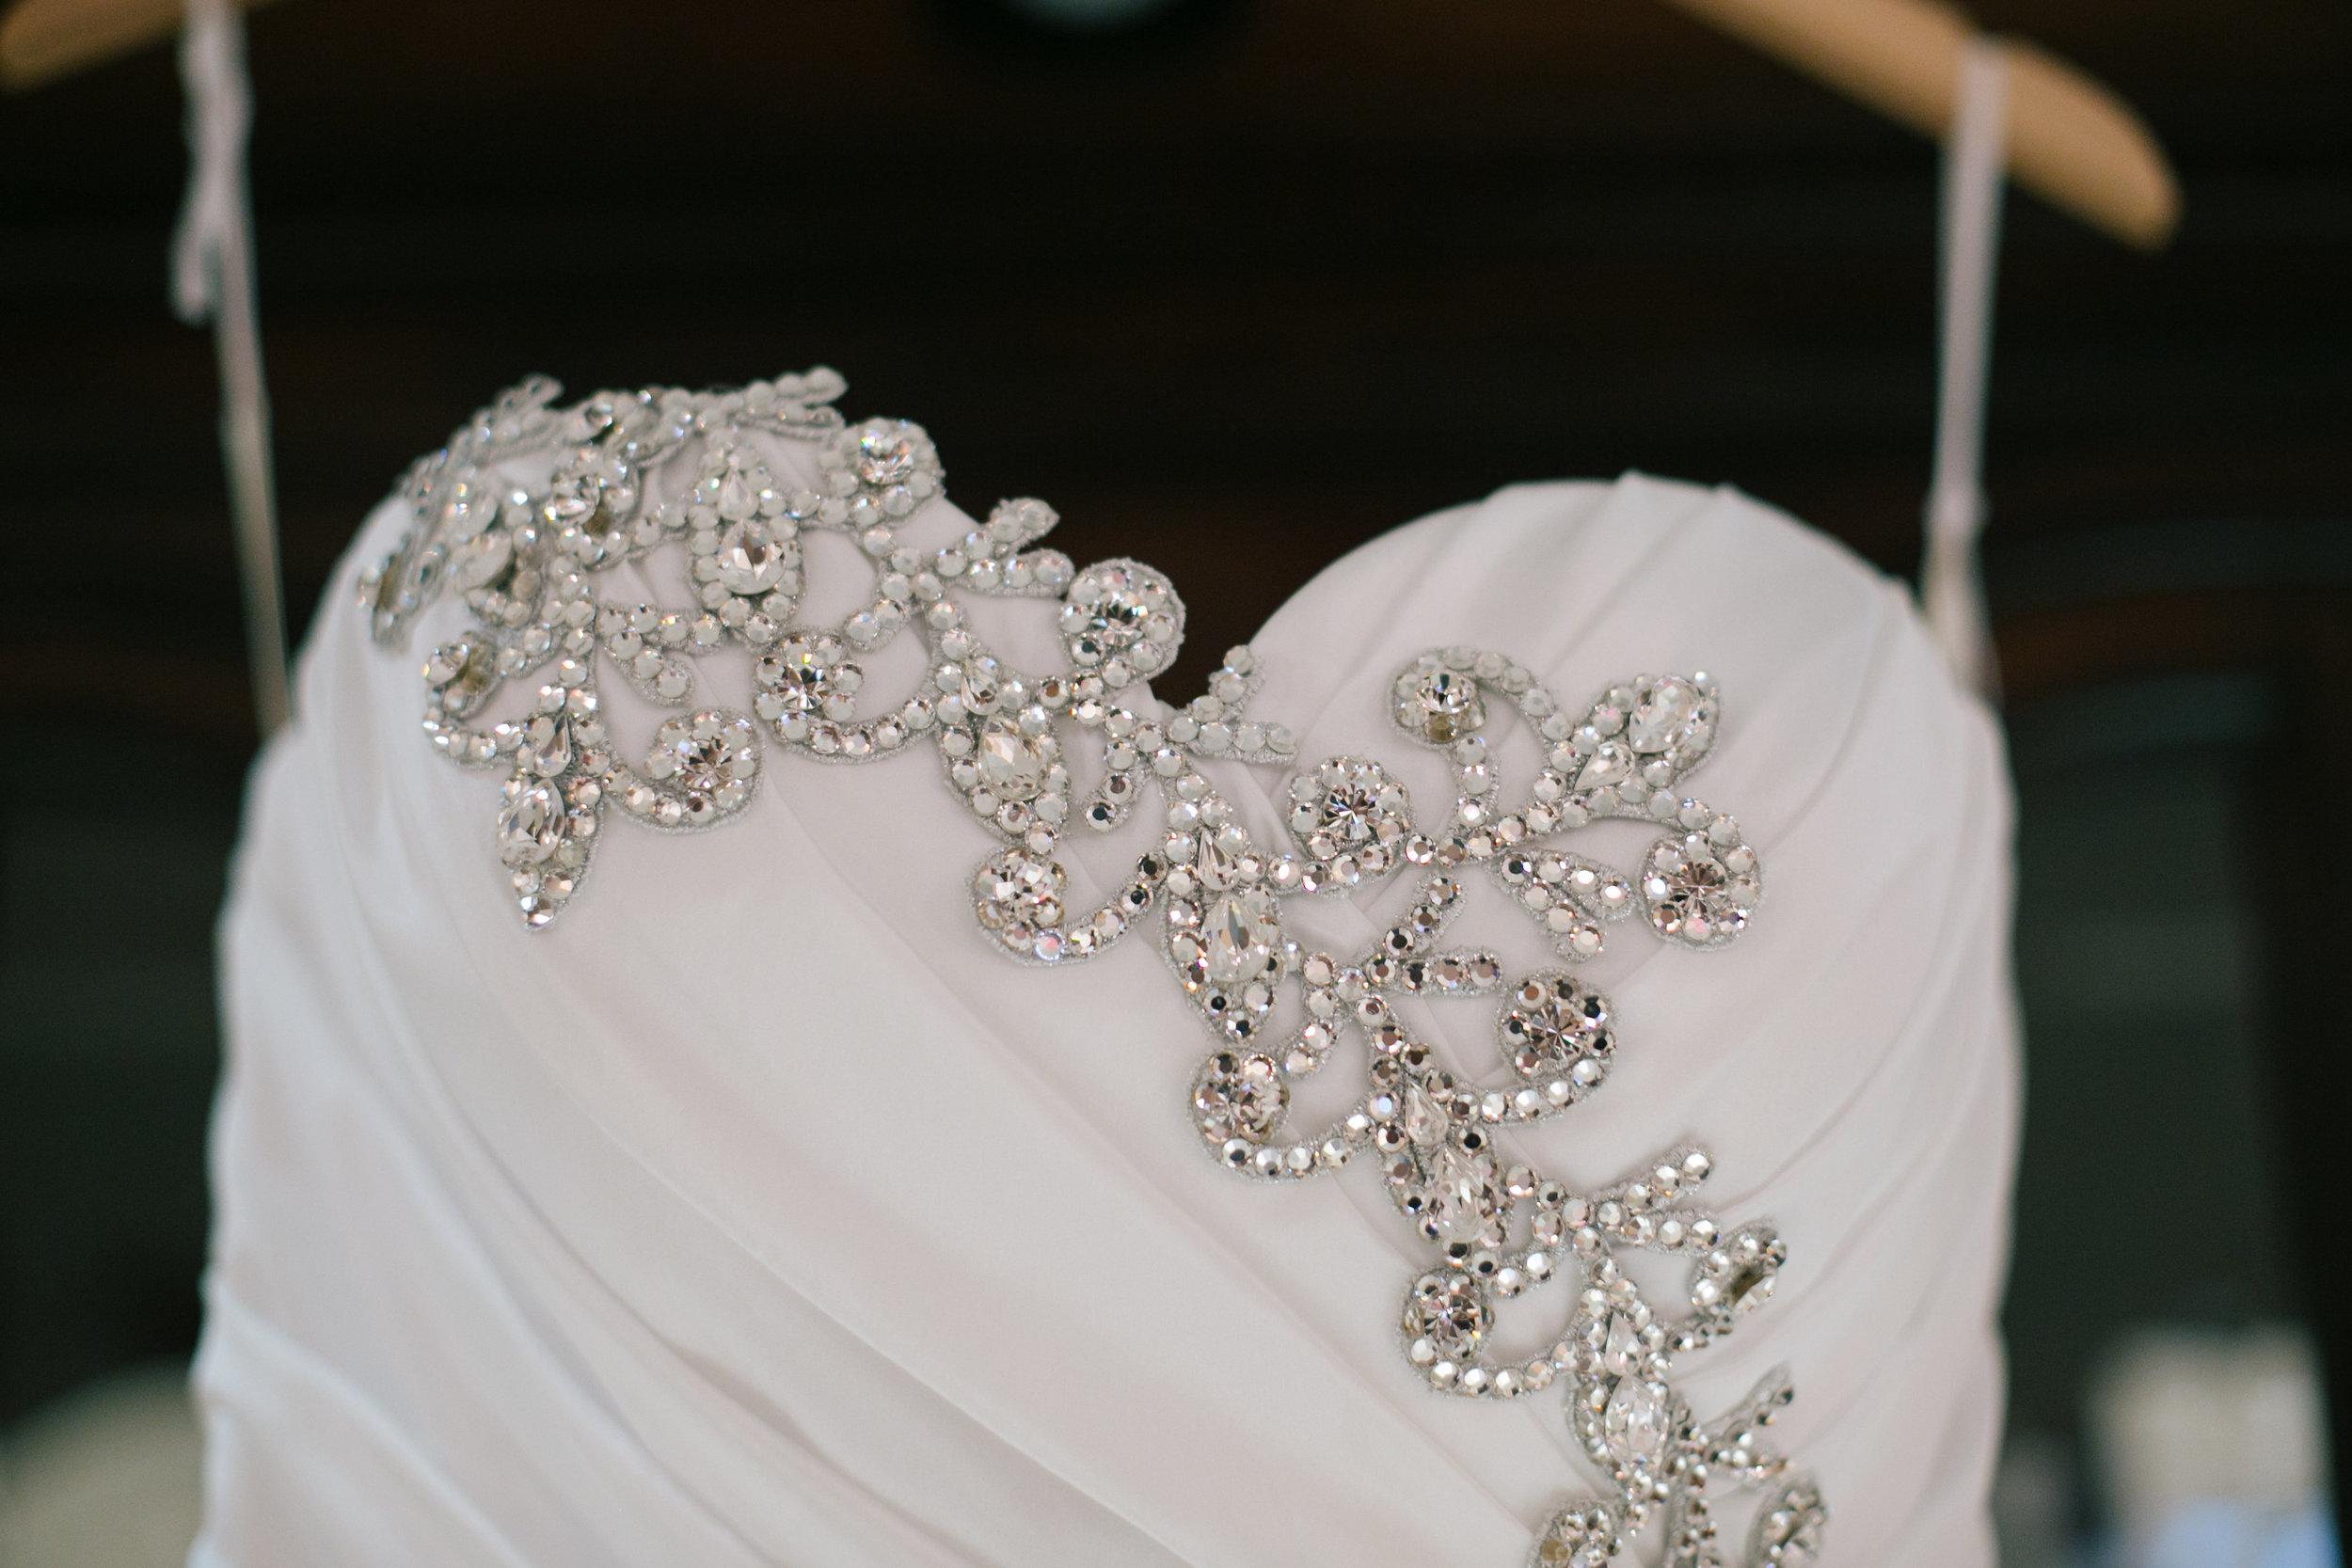 Ceci_New_York_Custom_Invitation_ New_Jersey_Wedding_Luxury_Personalized_Ceci_Style_Bride_Foil_Stamping9.jpg